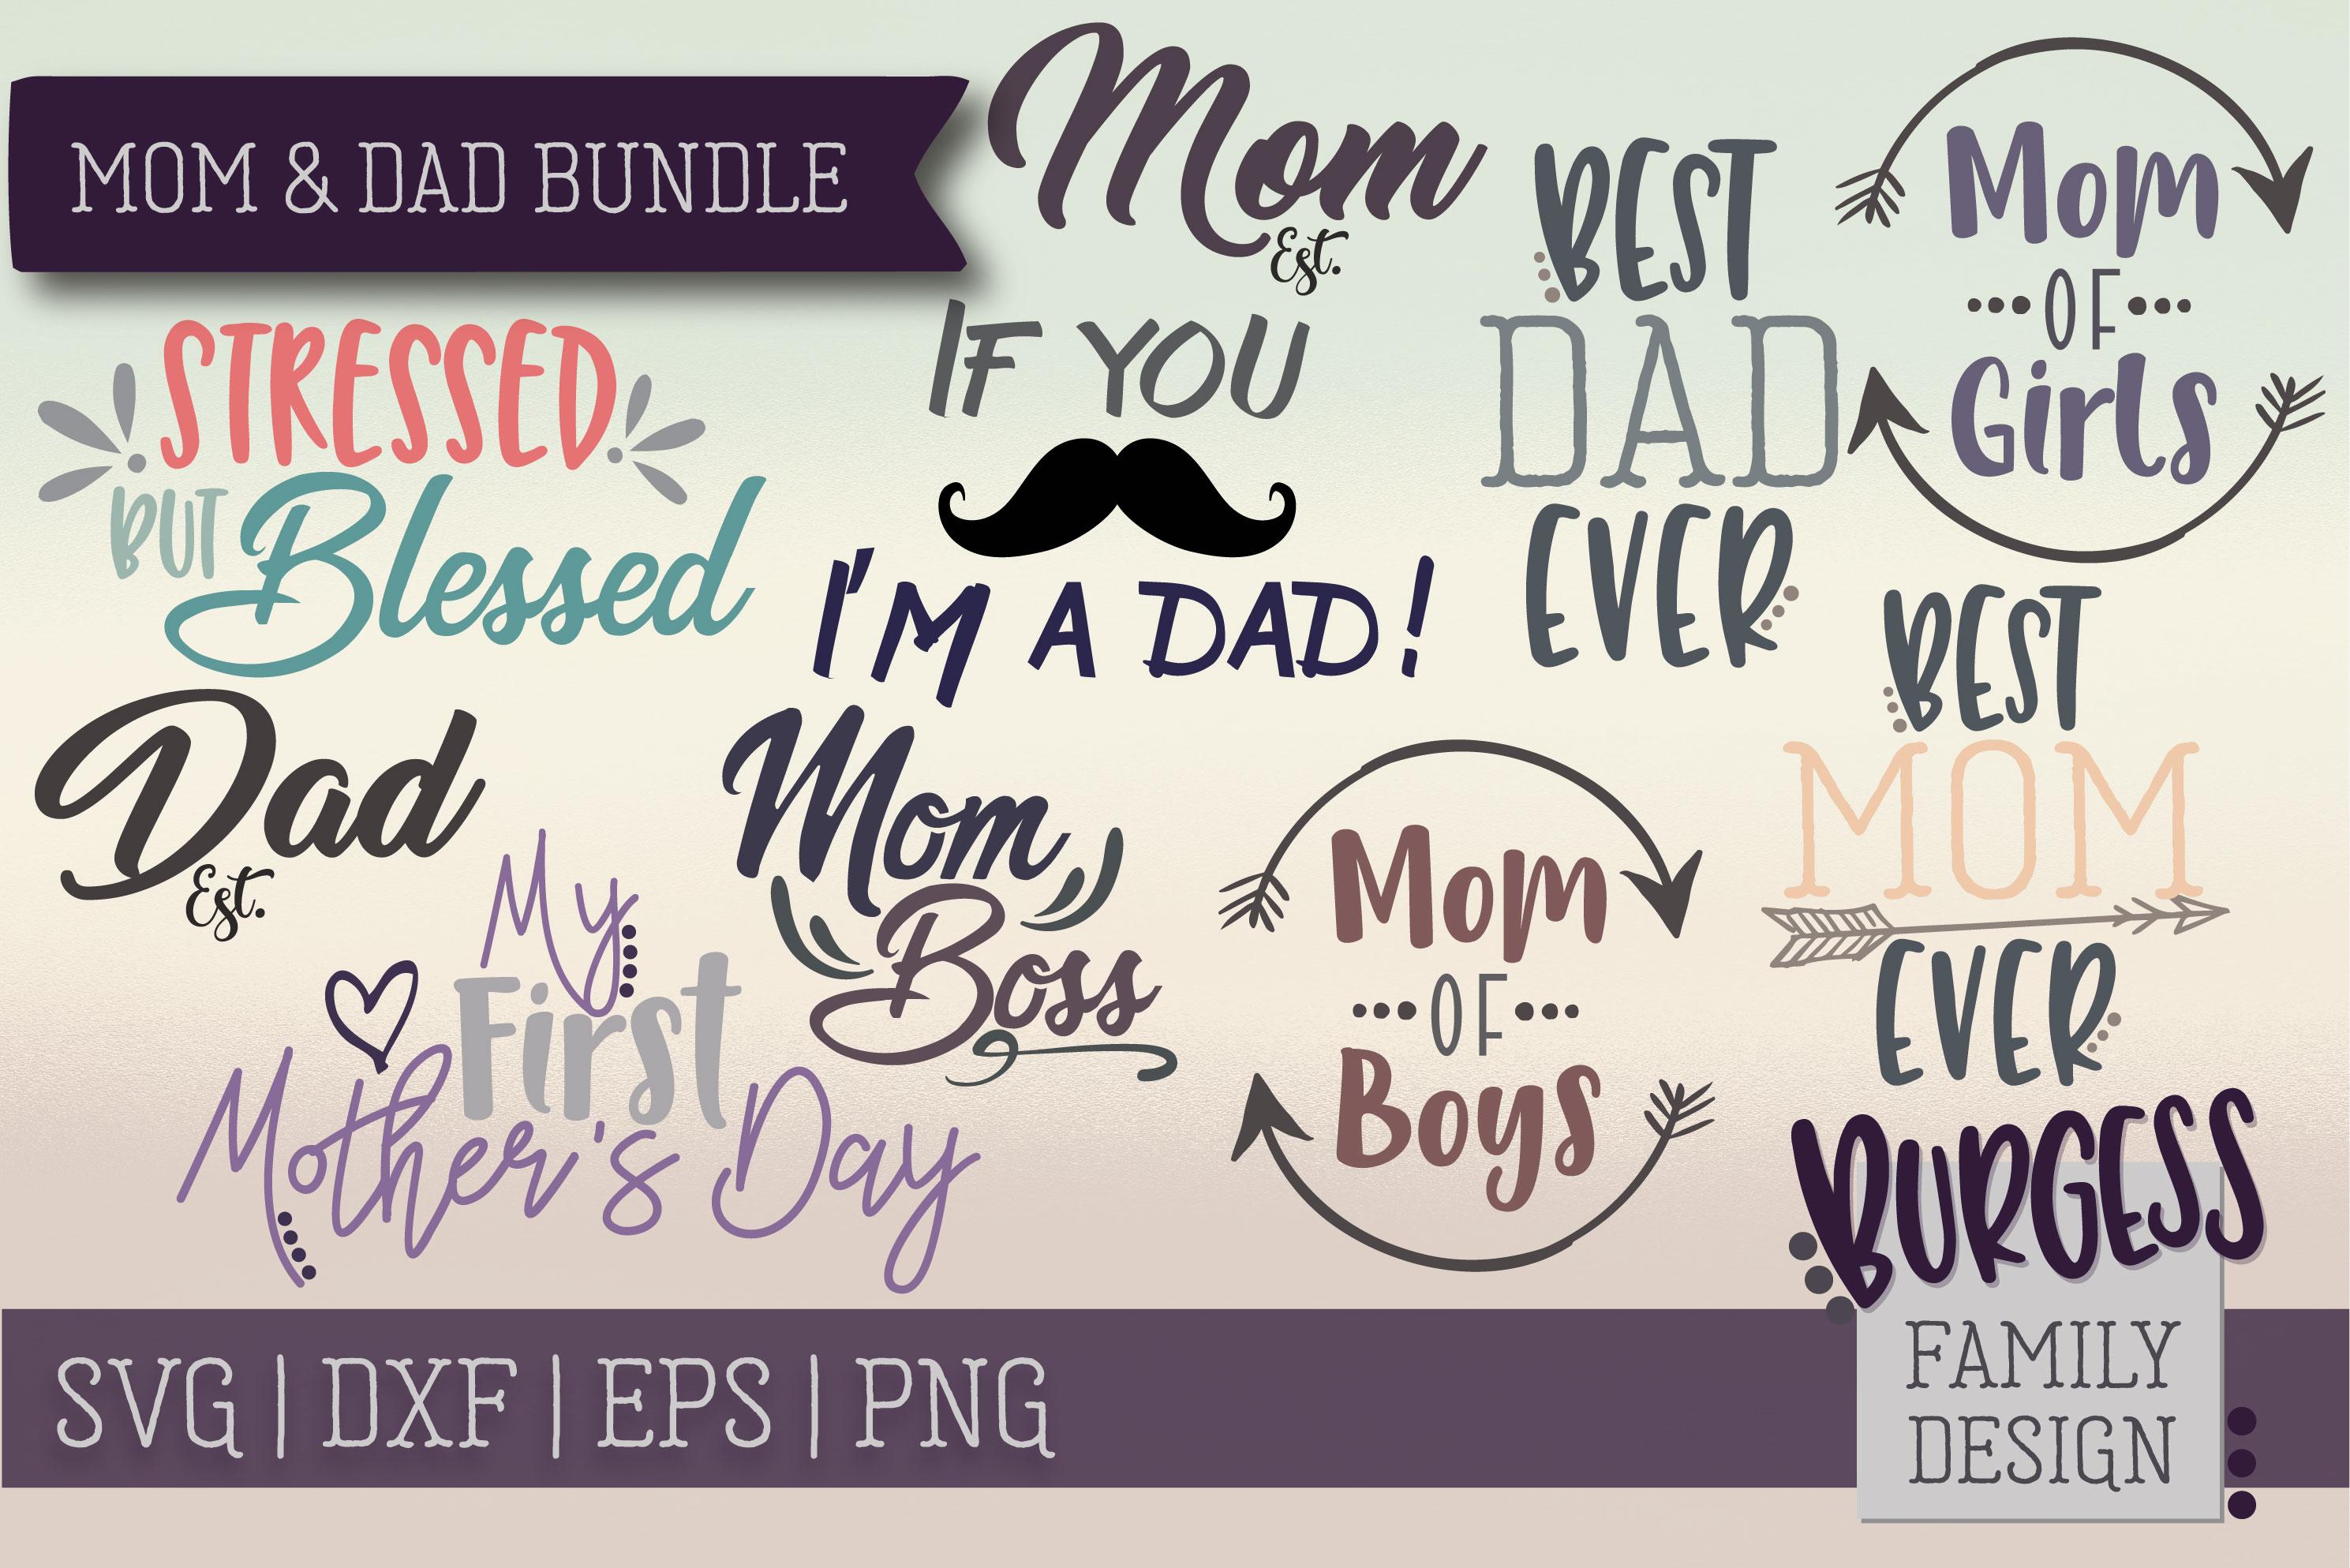 The starter bundle - Over 200 Designs | SVG DXF EPS PNG example image 16